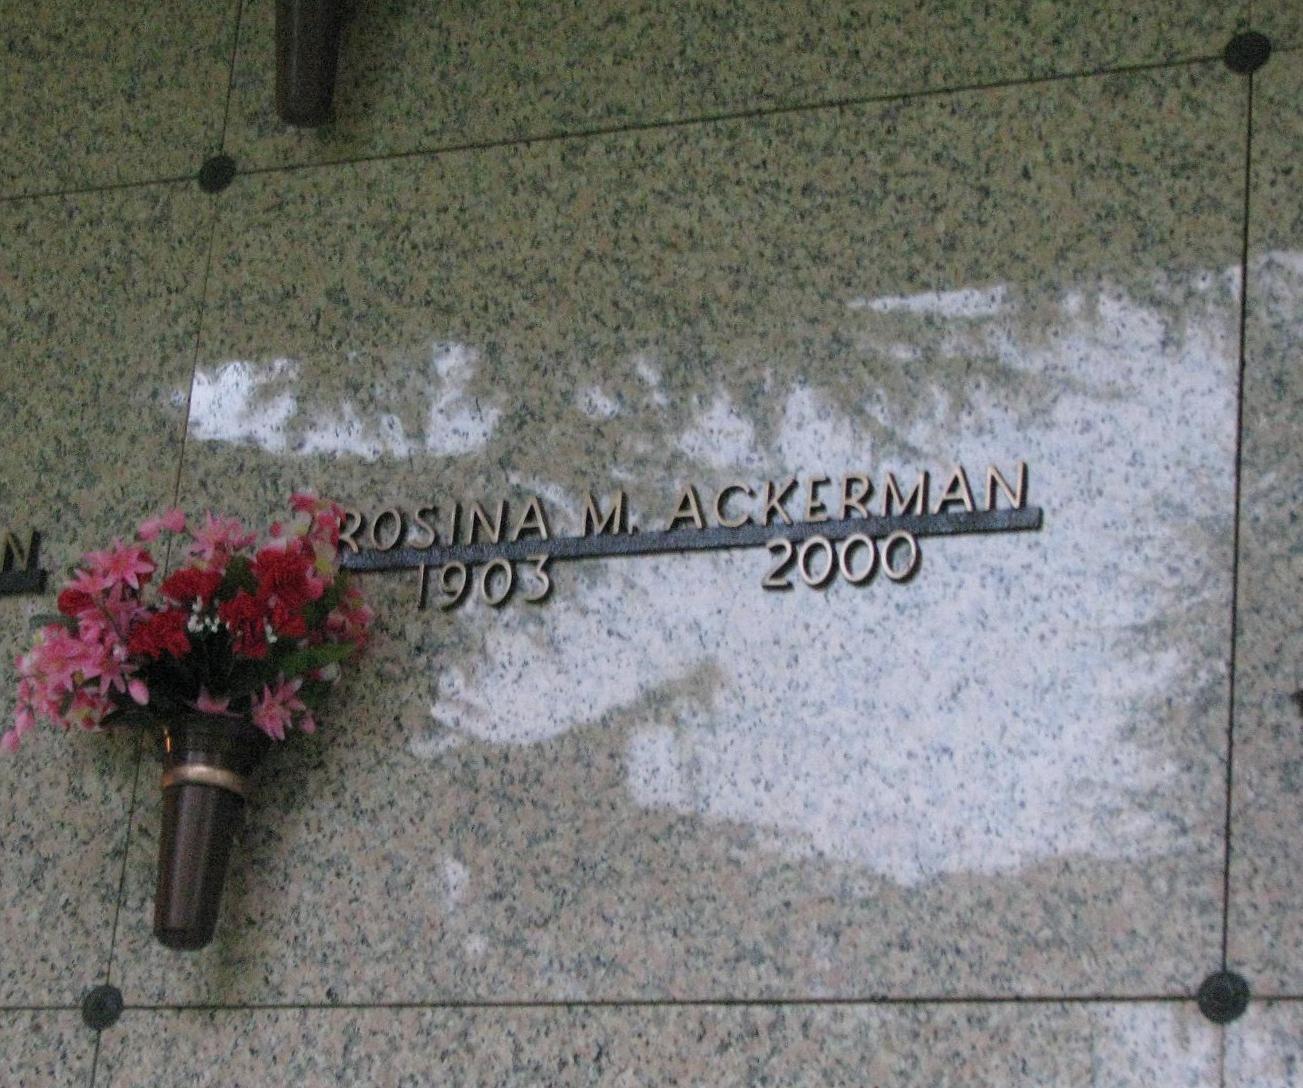 Rosina M Ackerman